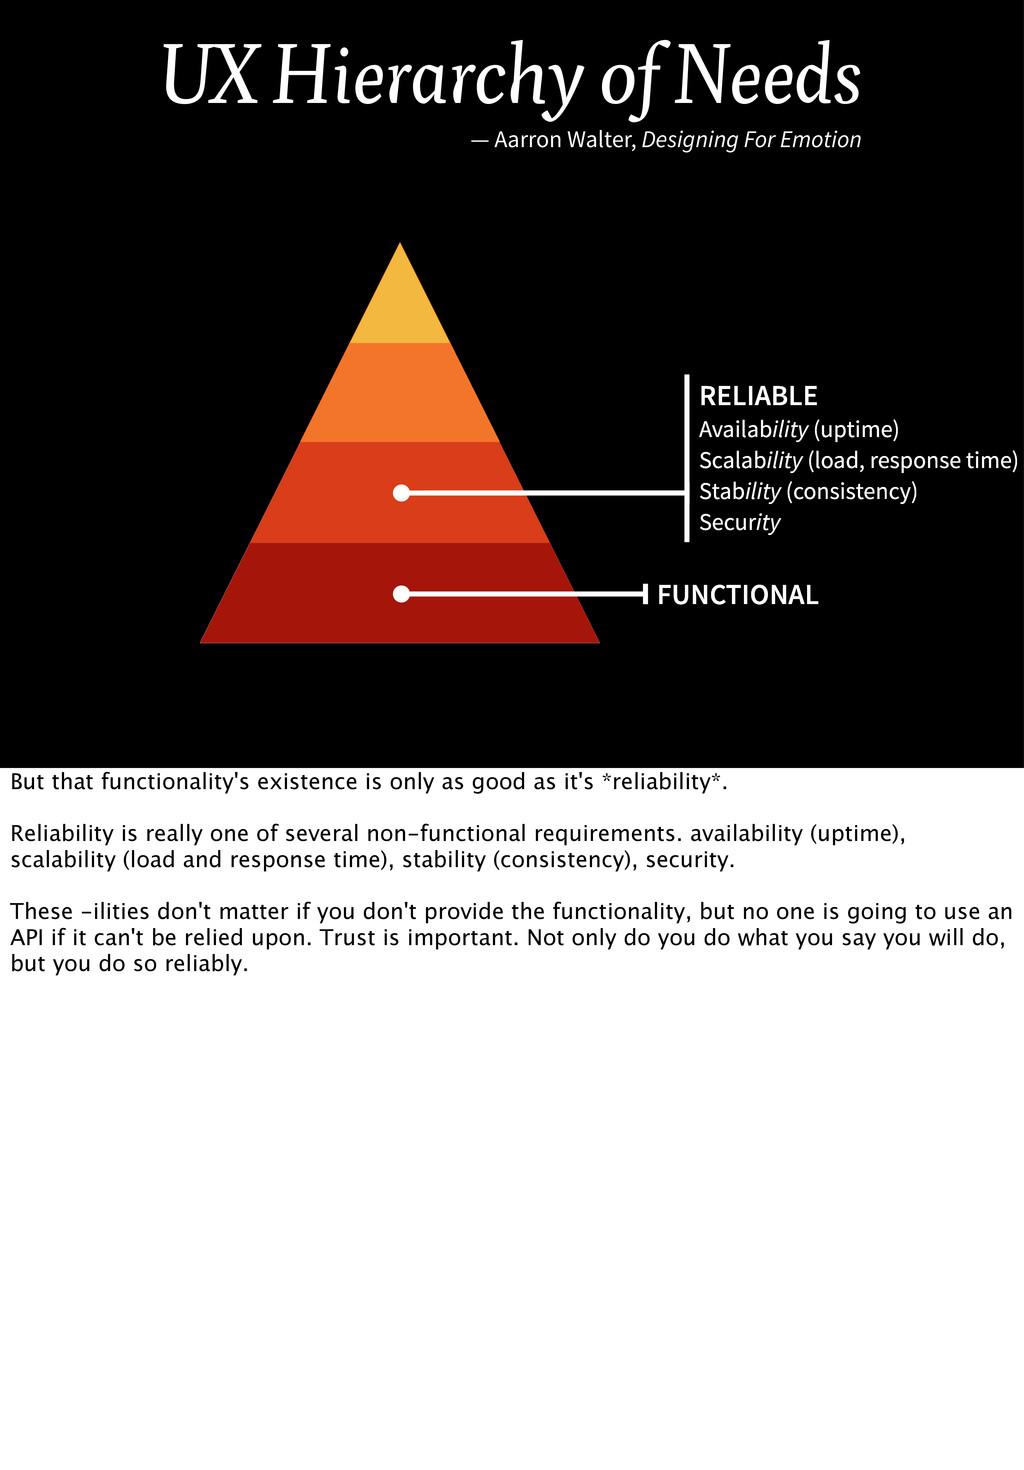 RELIABLE Availability (uptime) Scalability (loa...